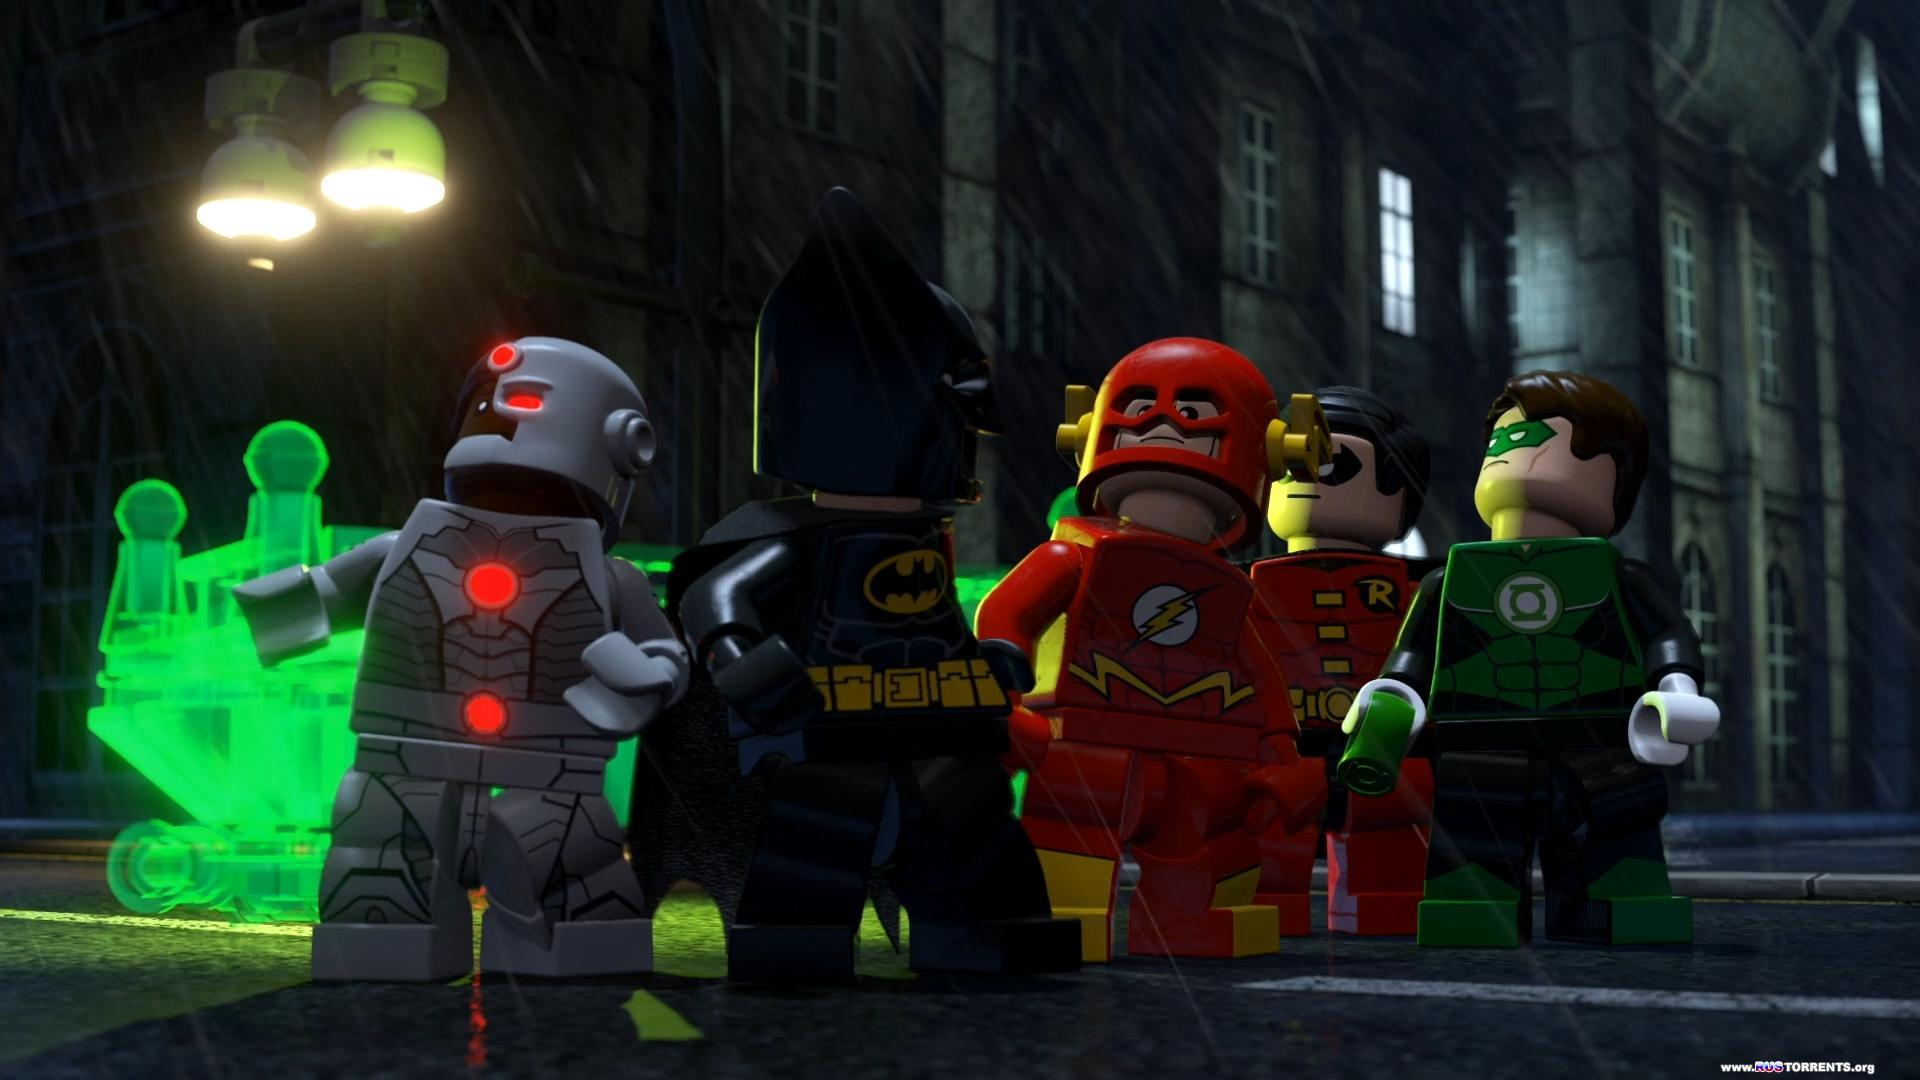 LEGO Бэтмен: Супер-герои DC объединяются | BDRip 1080p